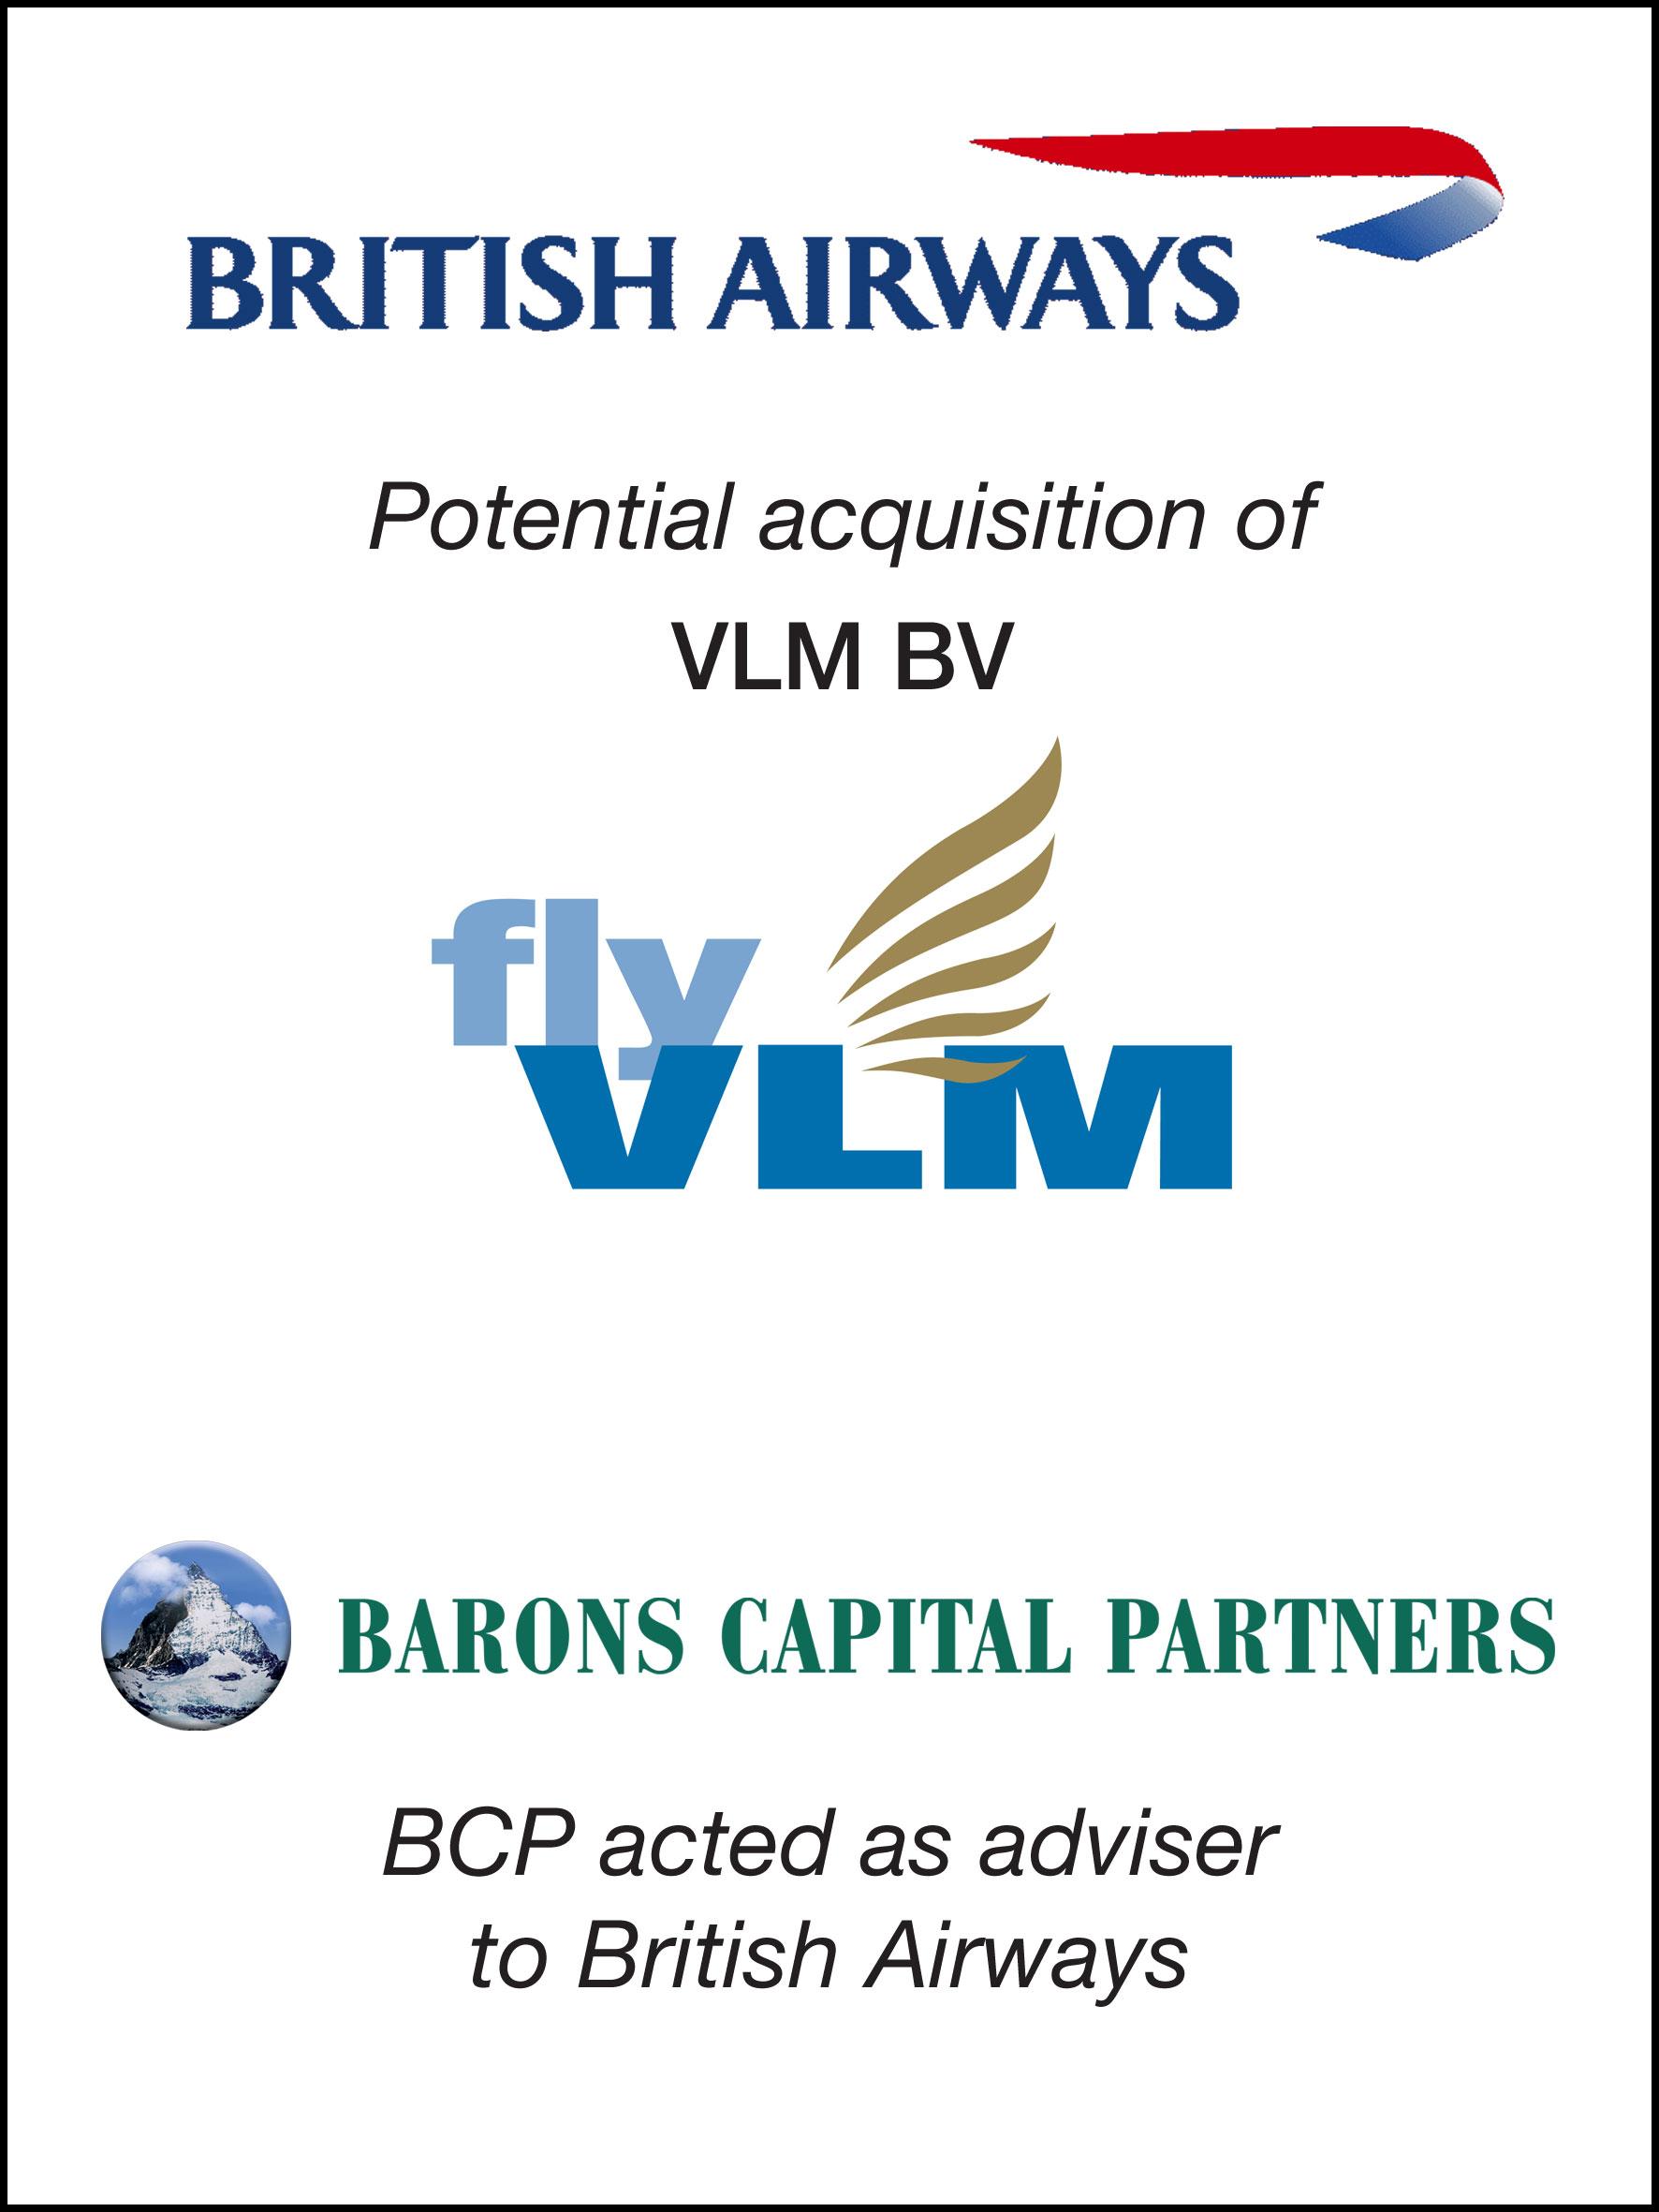 45_British Airways PLC